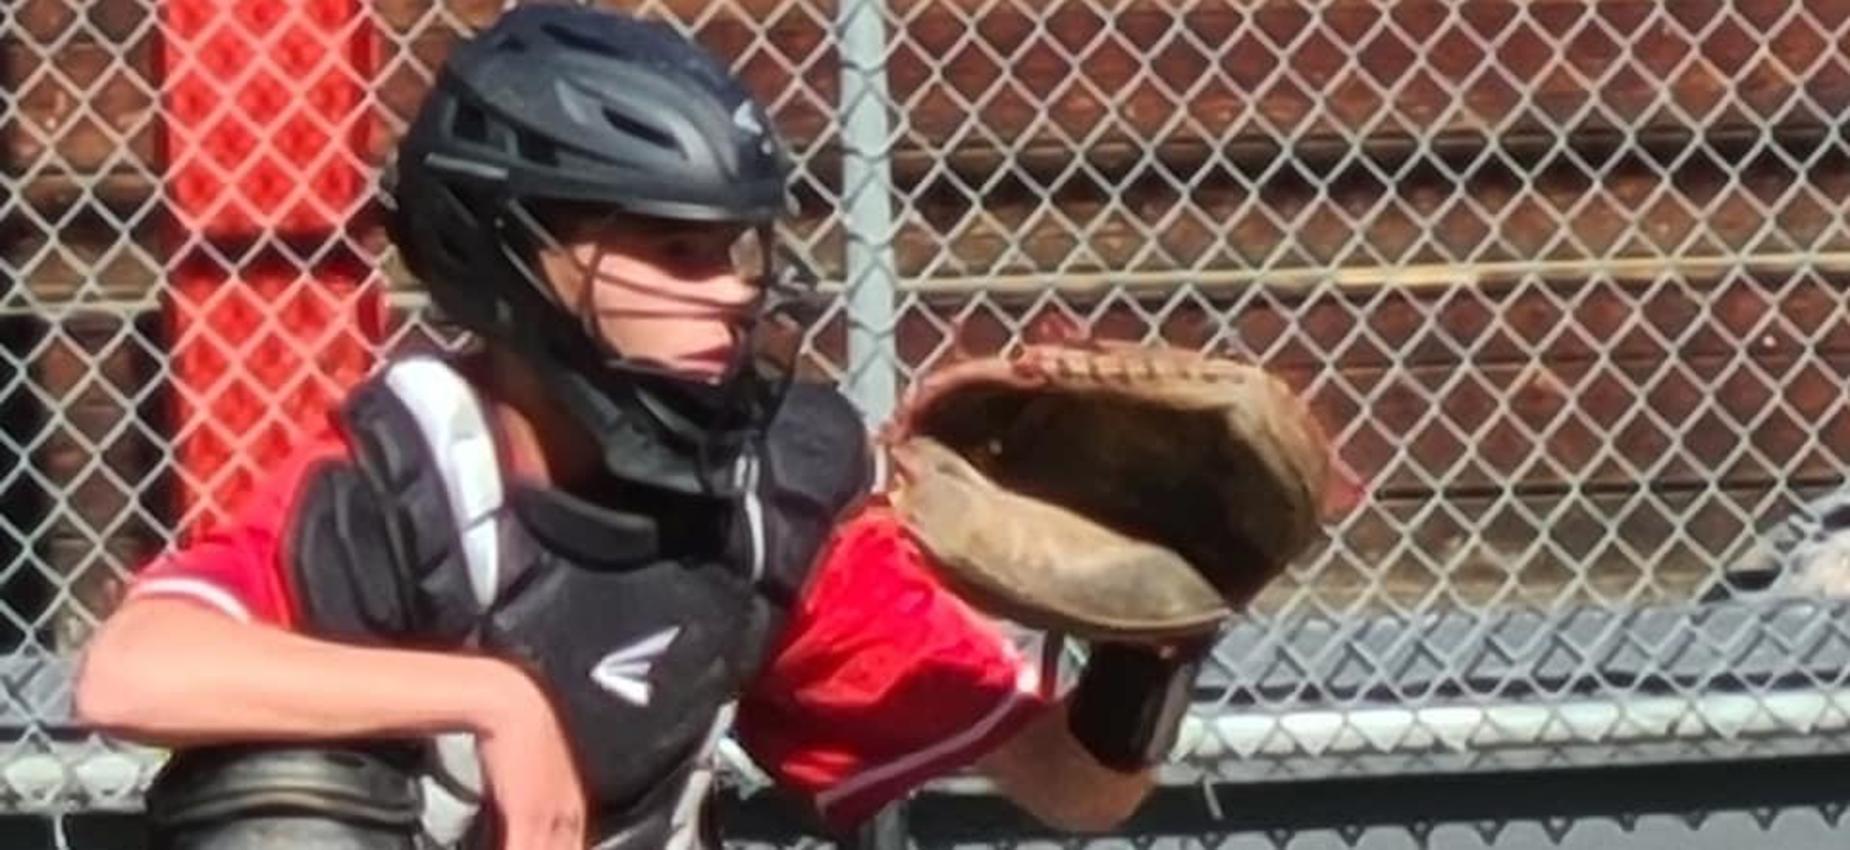 A baseball catcher waits to catch the ball.